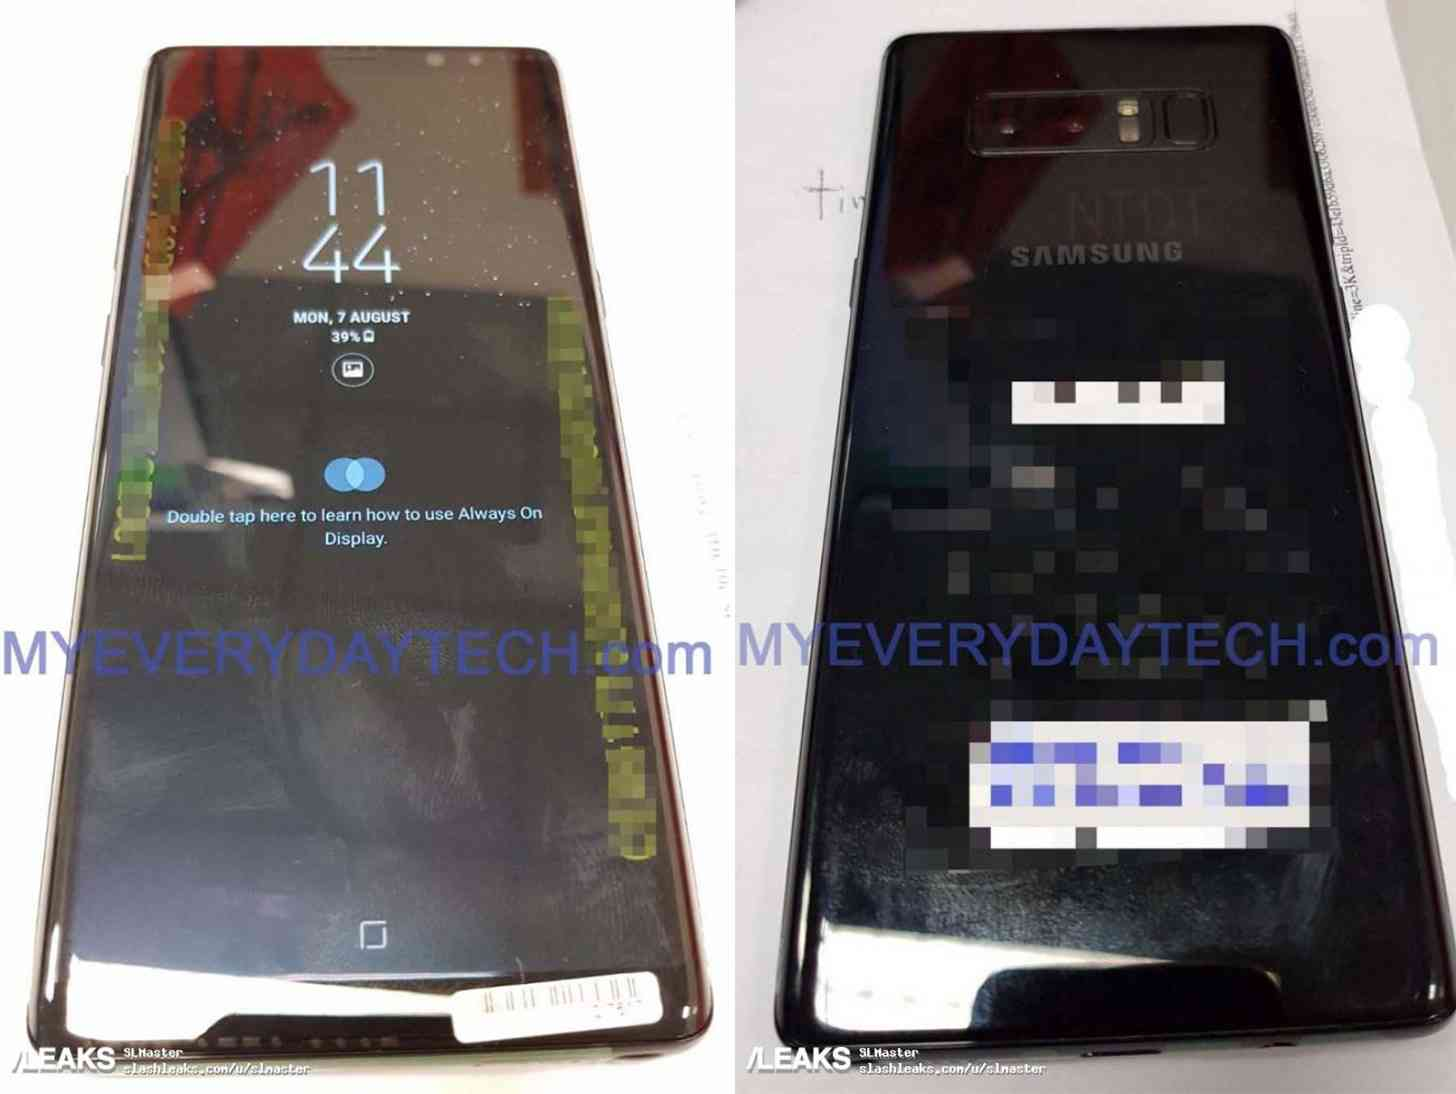 Samsung Galaxy Note 8 live photos